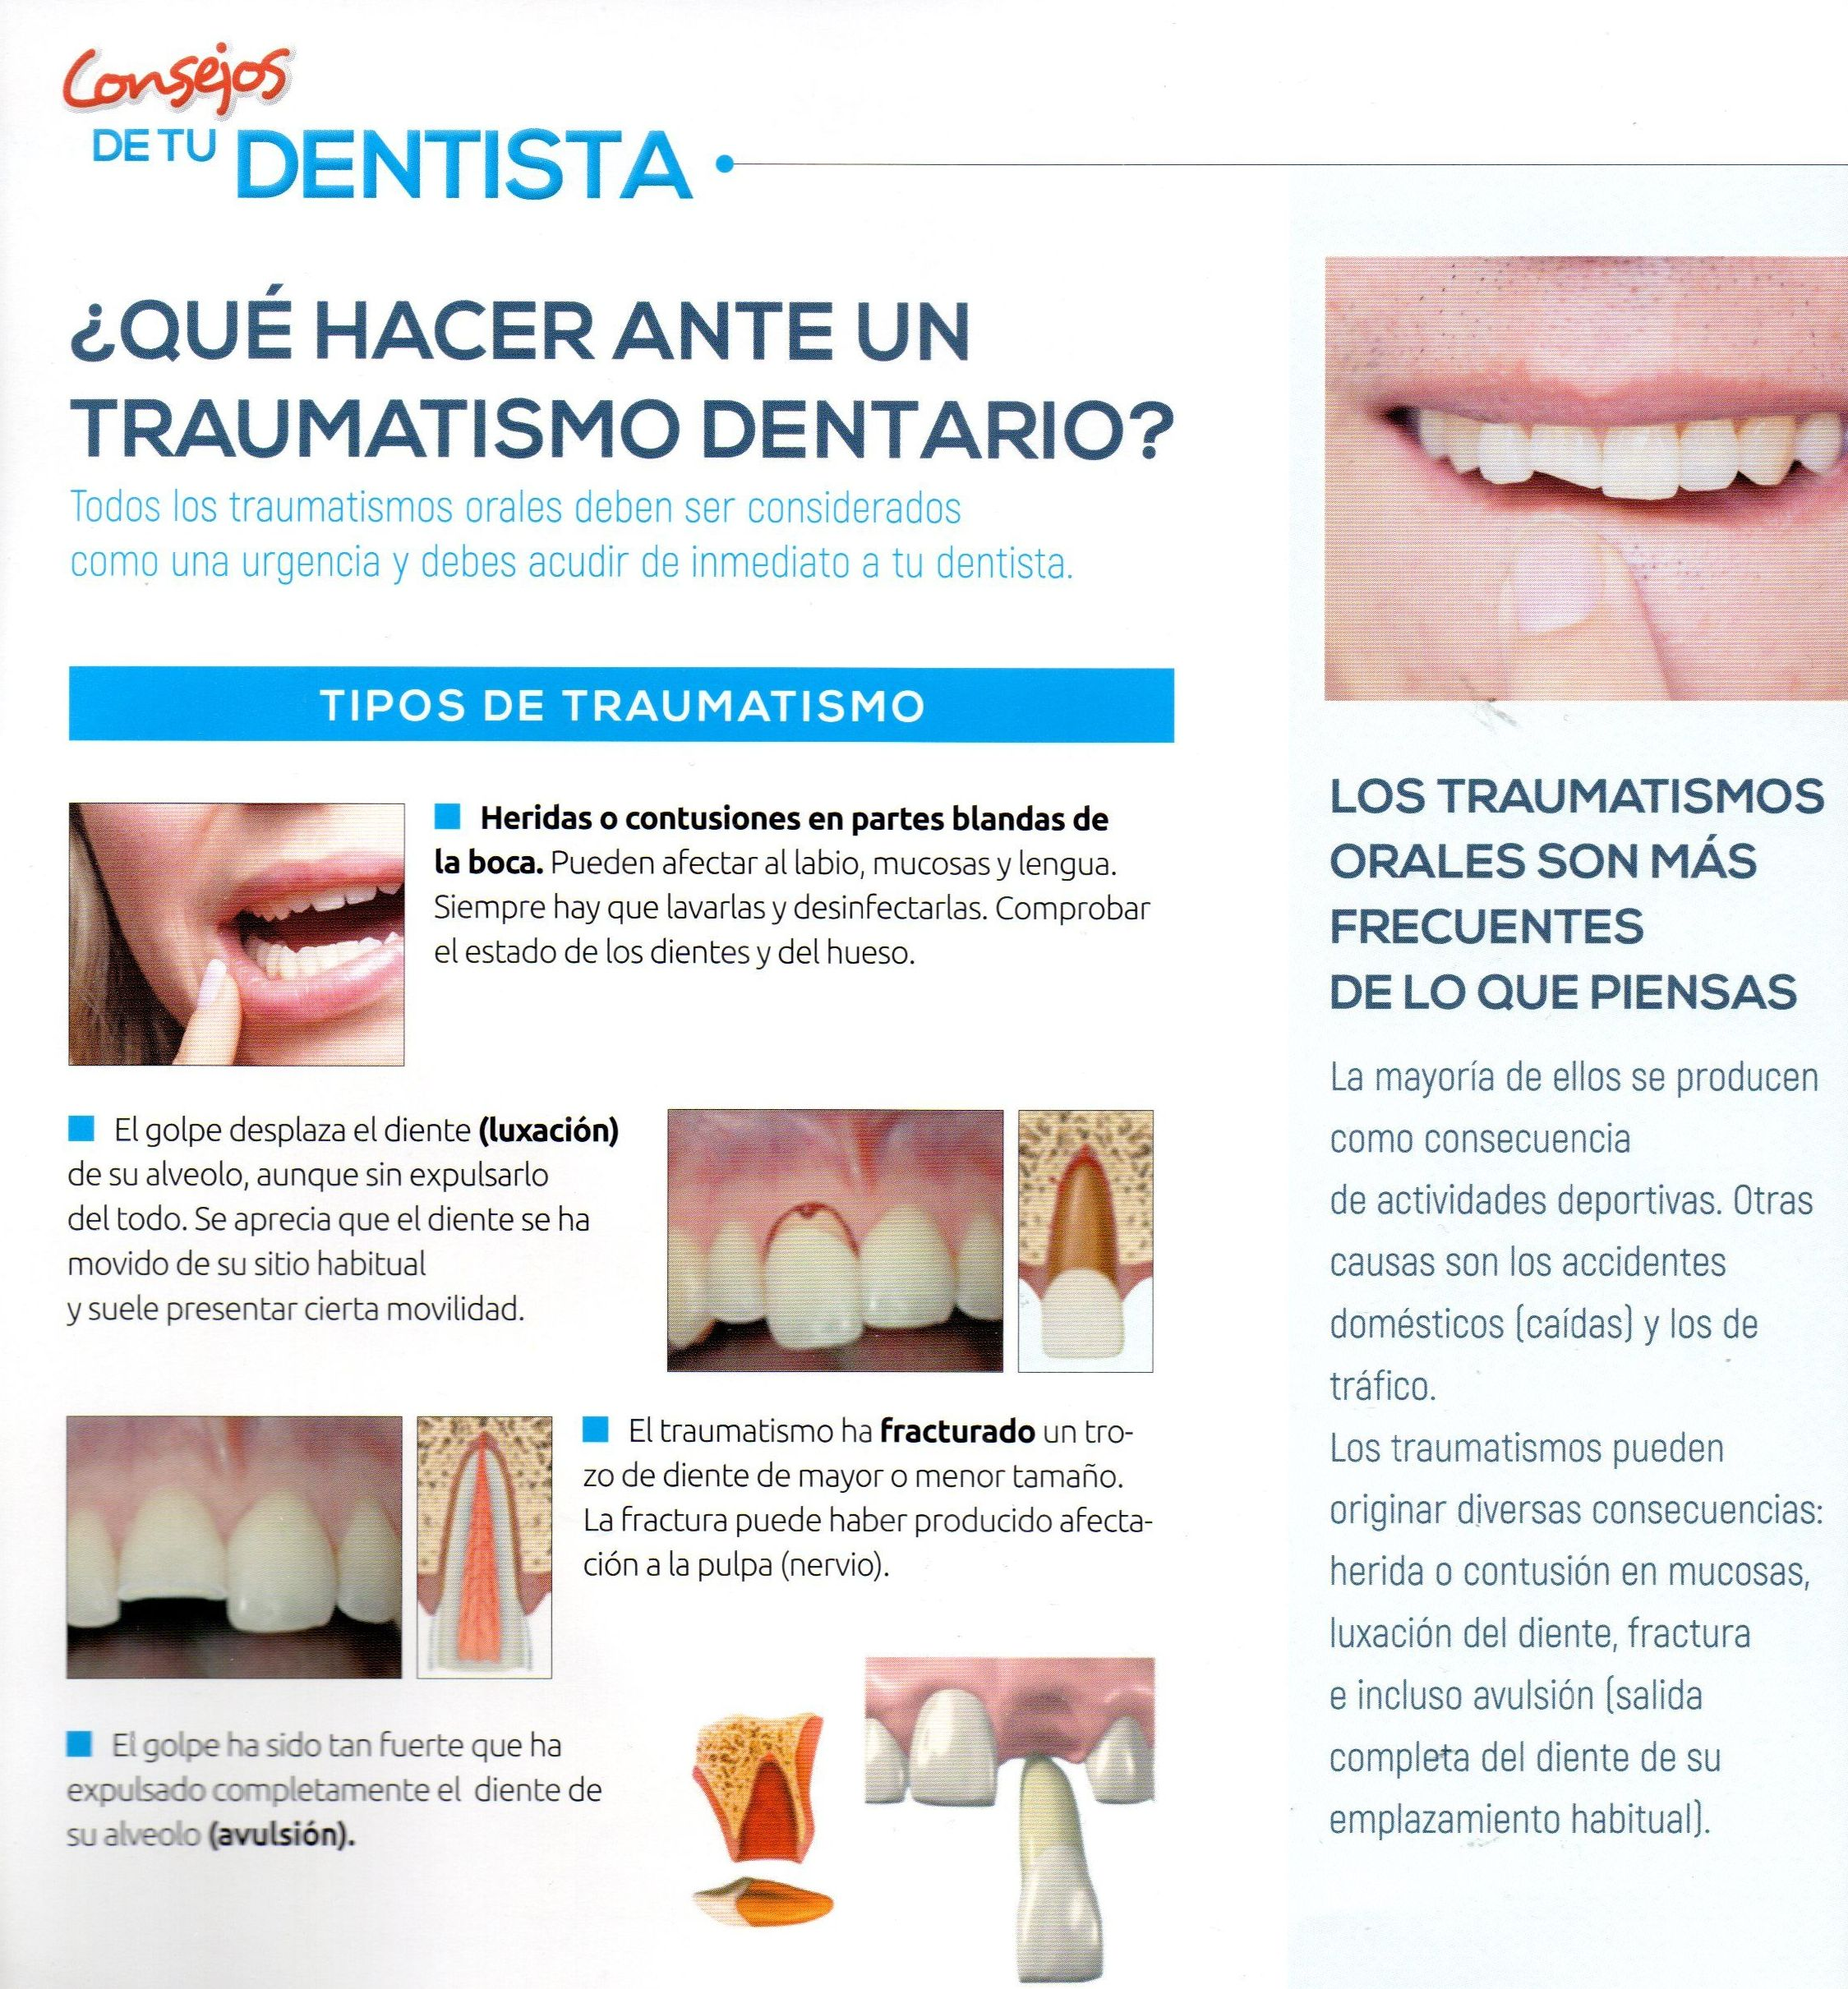 dentista en cadiz javier perez traum 1